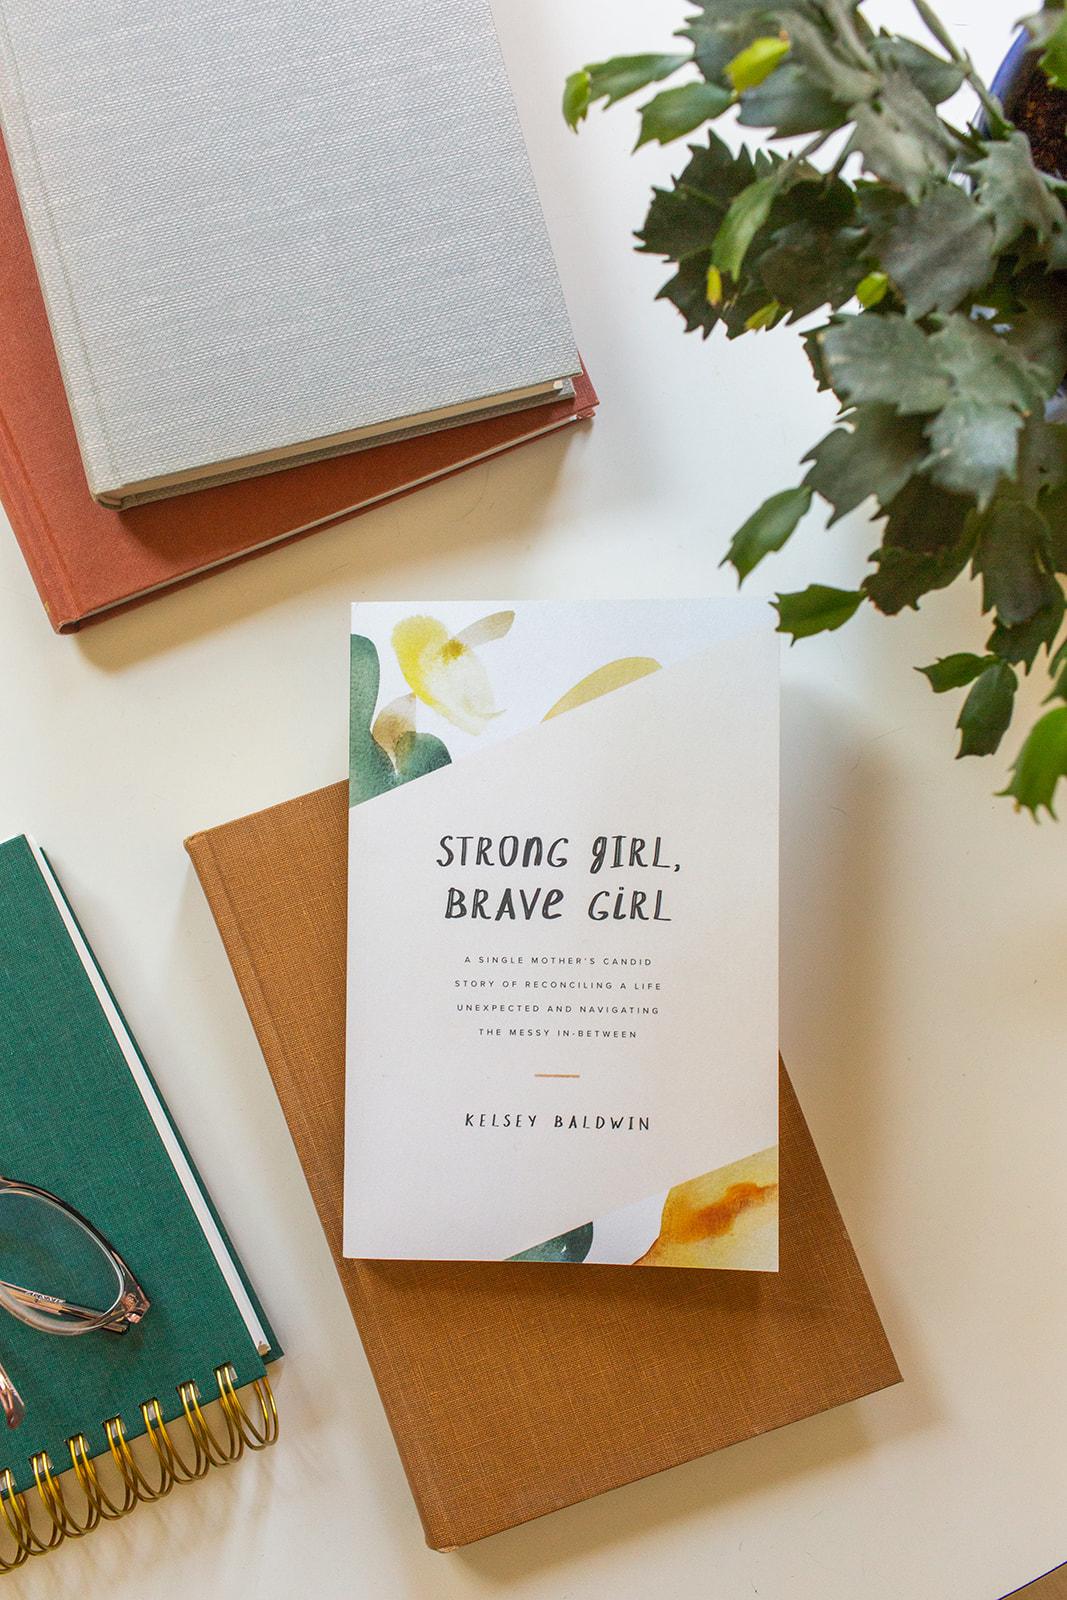 KelseyBaldwin-StrongGirlBraveGirl_book_product_shots_034.jpg